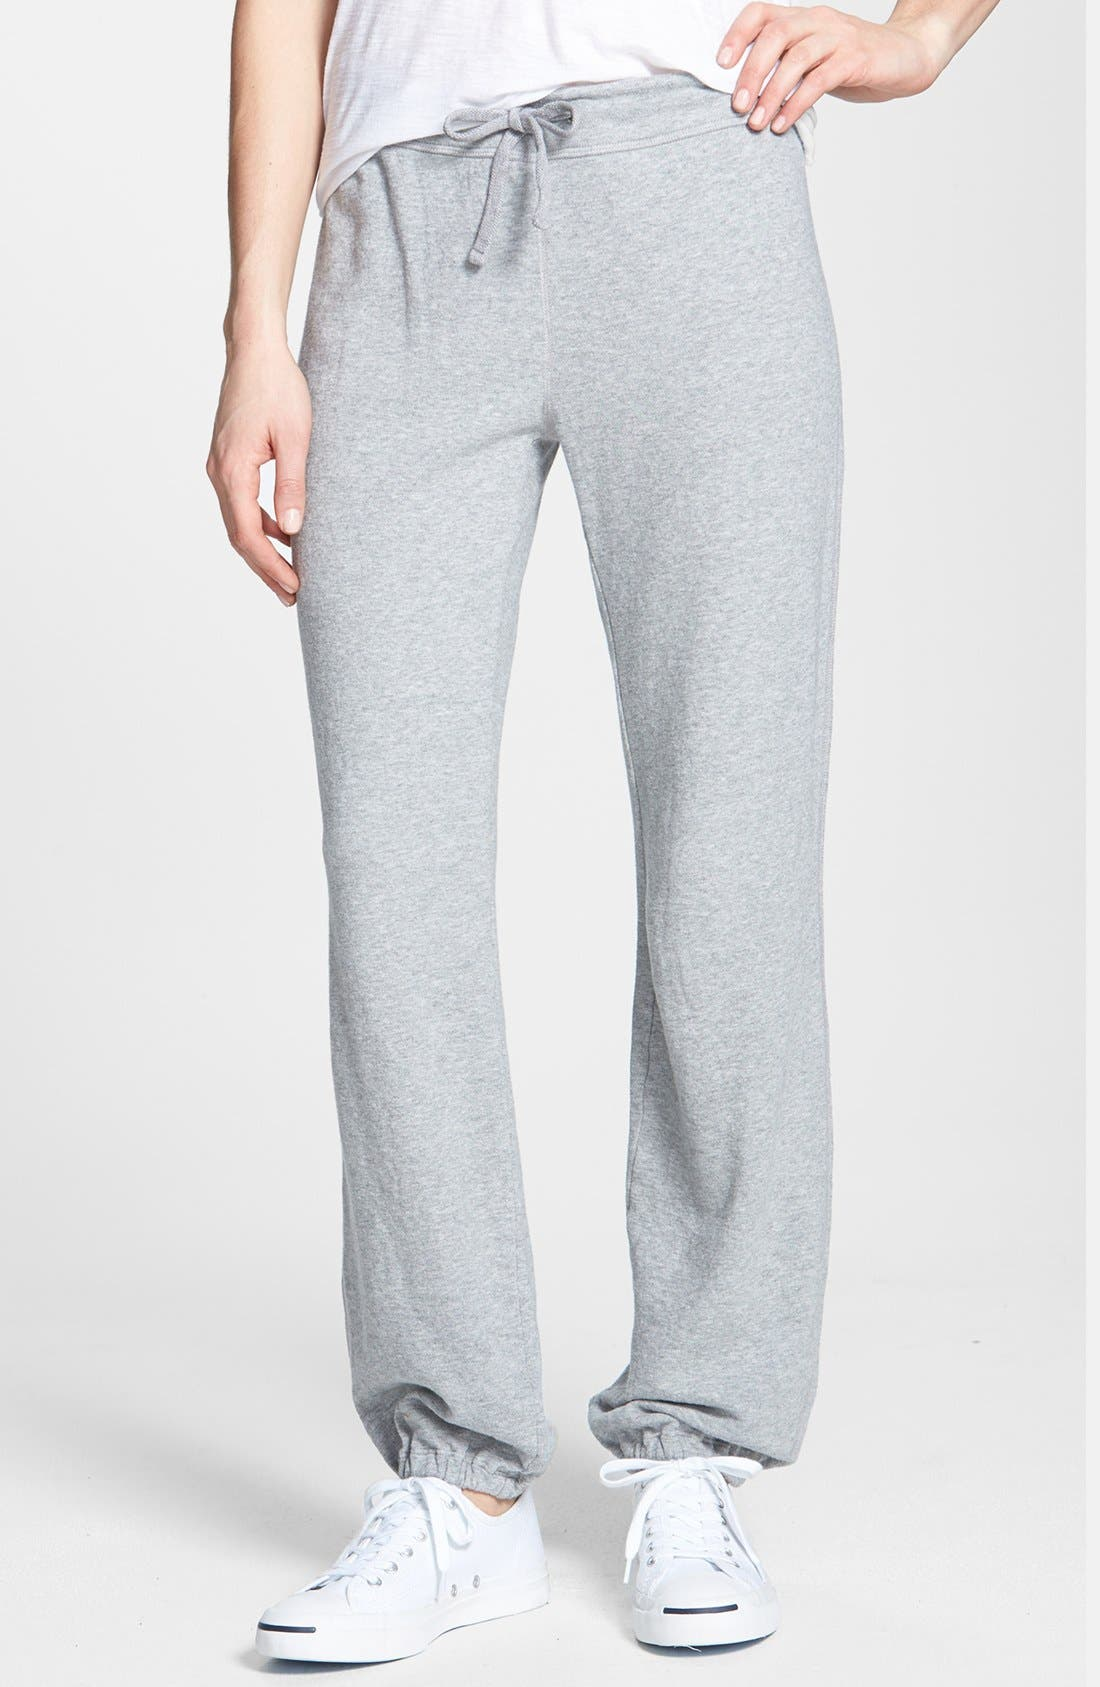 Alternate Image 1 Selected - James Perse 'Vintage' Fleece Sweatpants